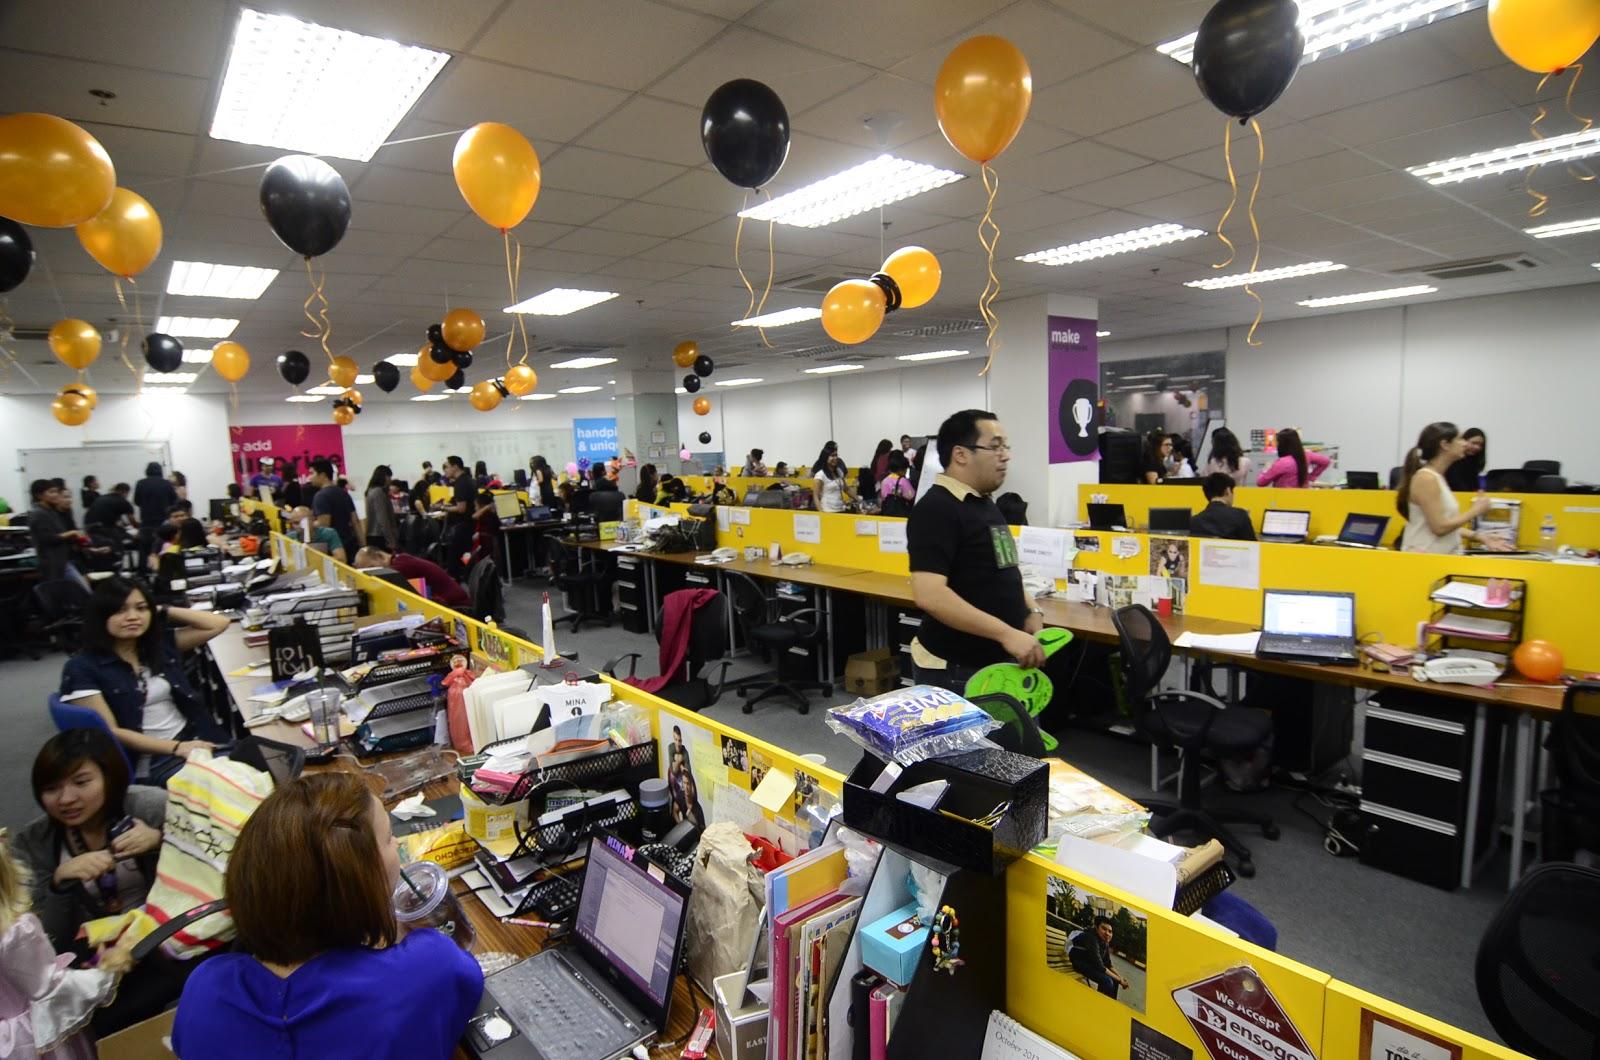 26 Wonderful Office Halloween Decorating Contest Ideas ...